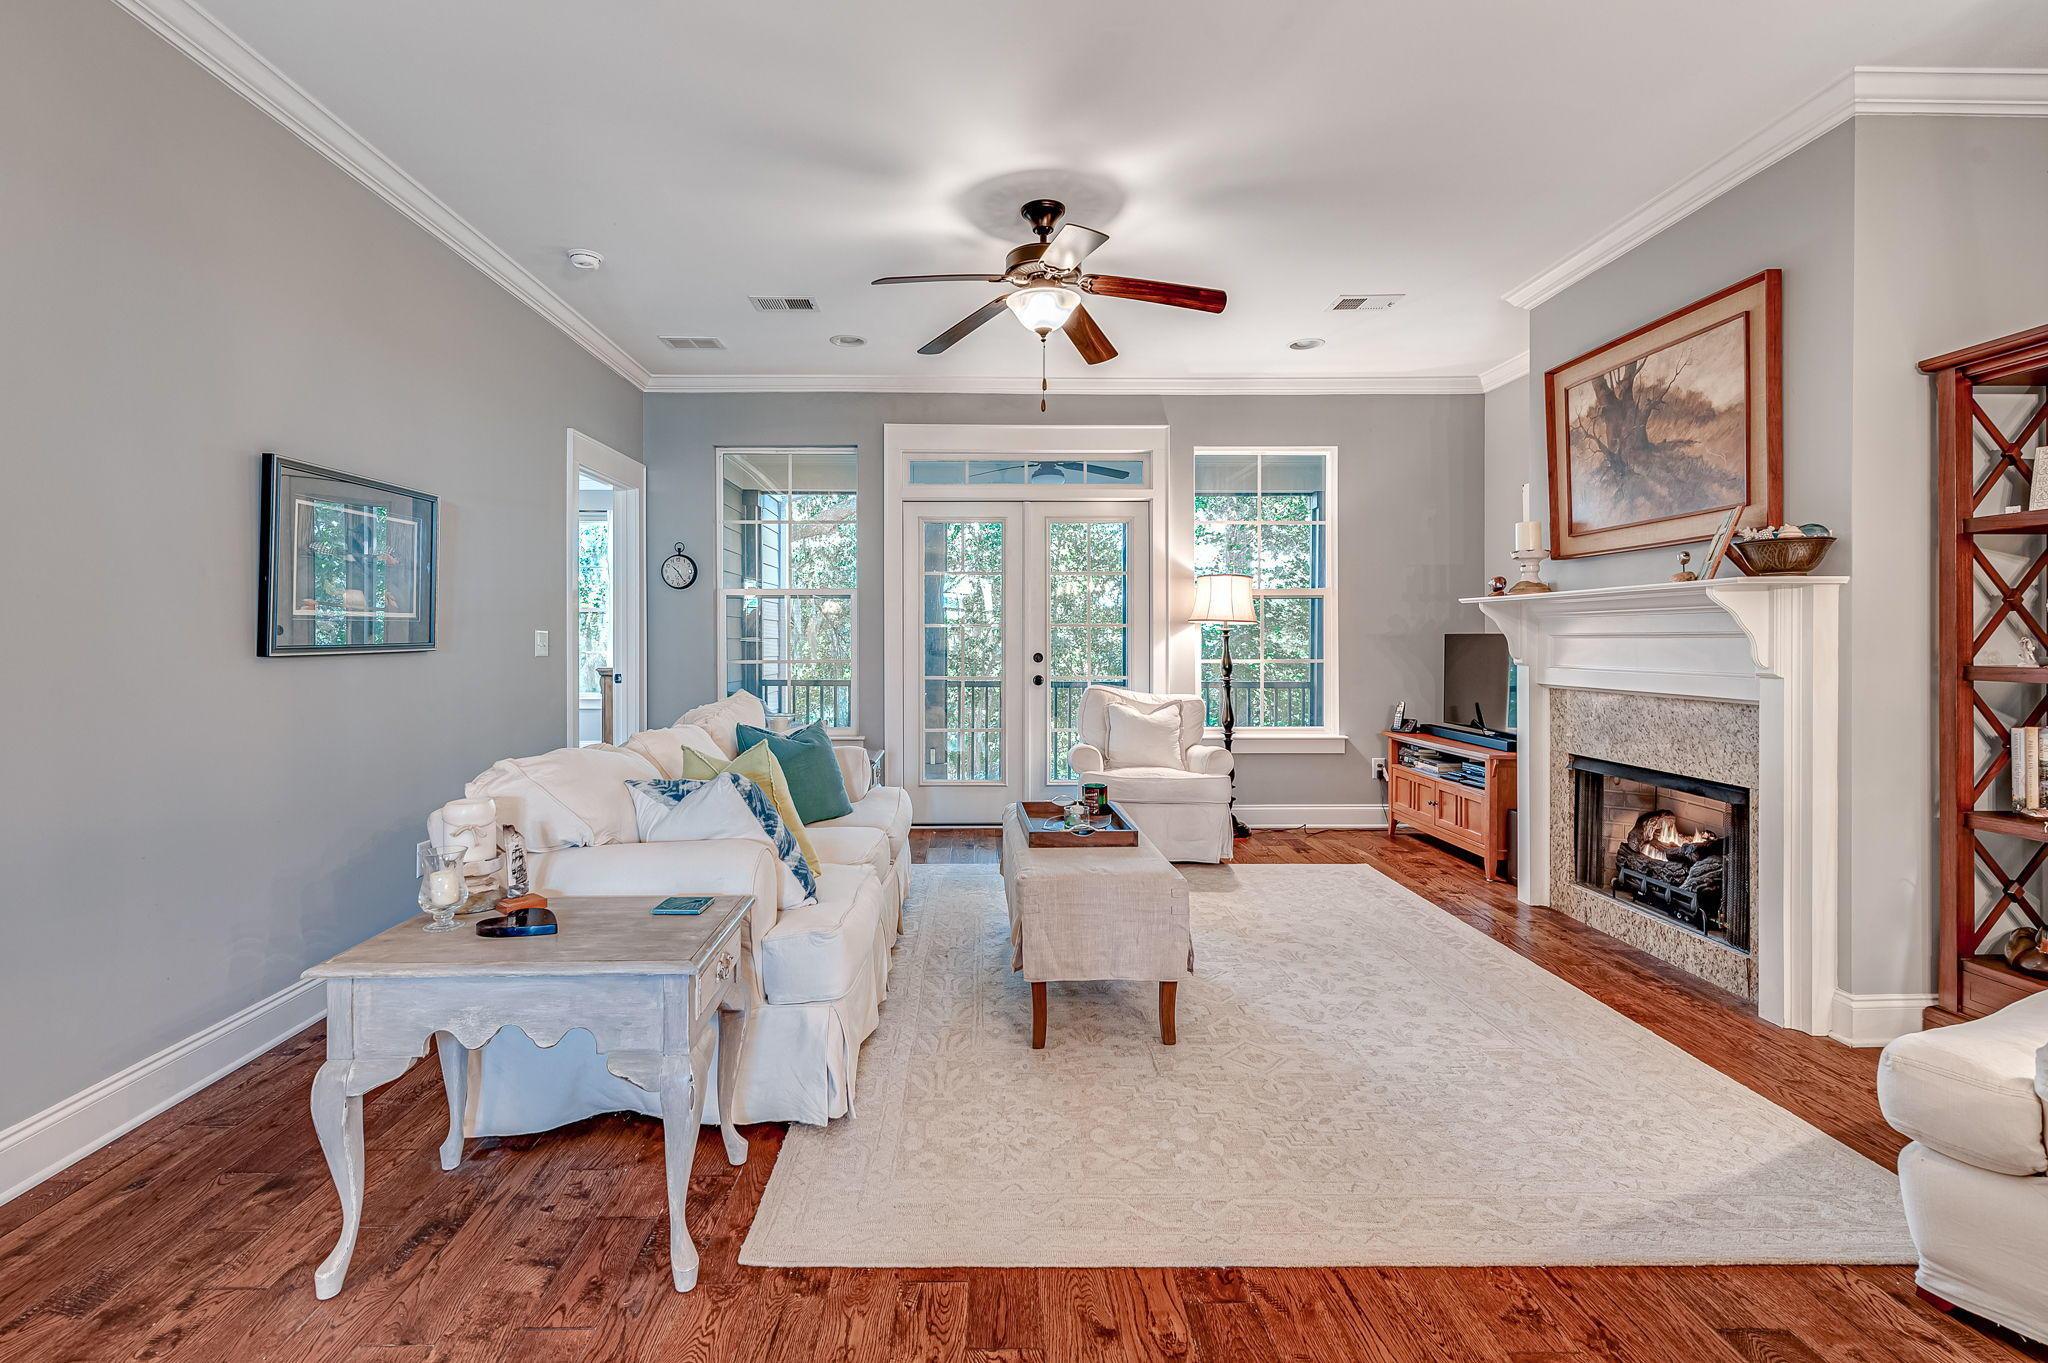 Etiwan Pointe Homes For Sale - 159 Slipper Shell, Mount Pleasant, SC - 35